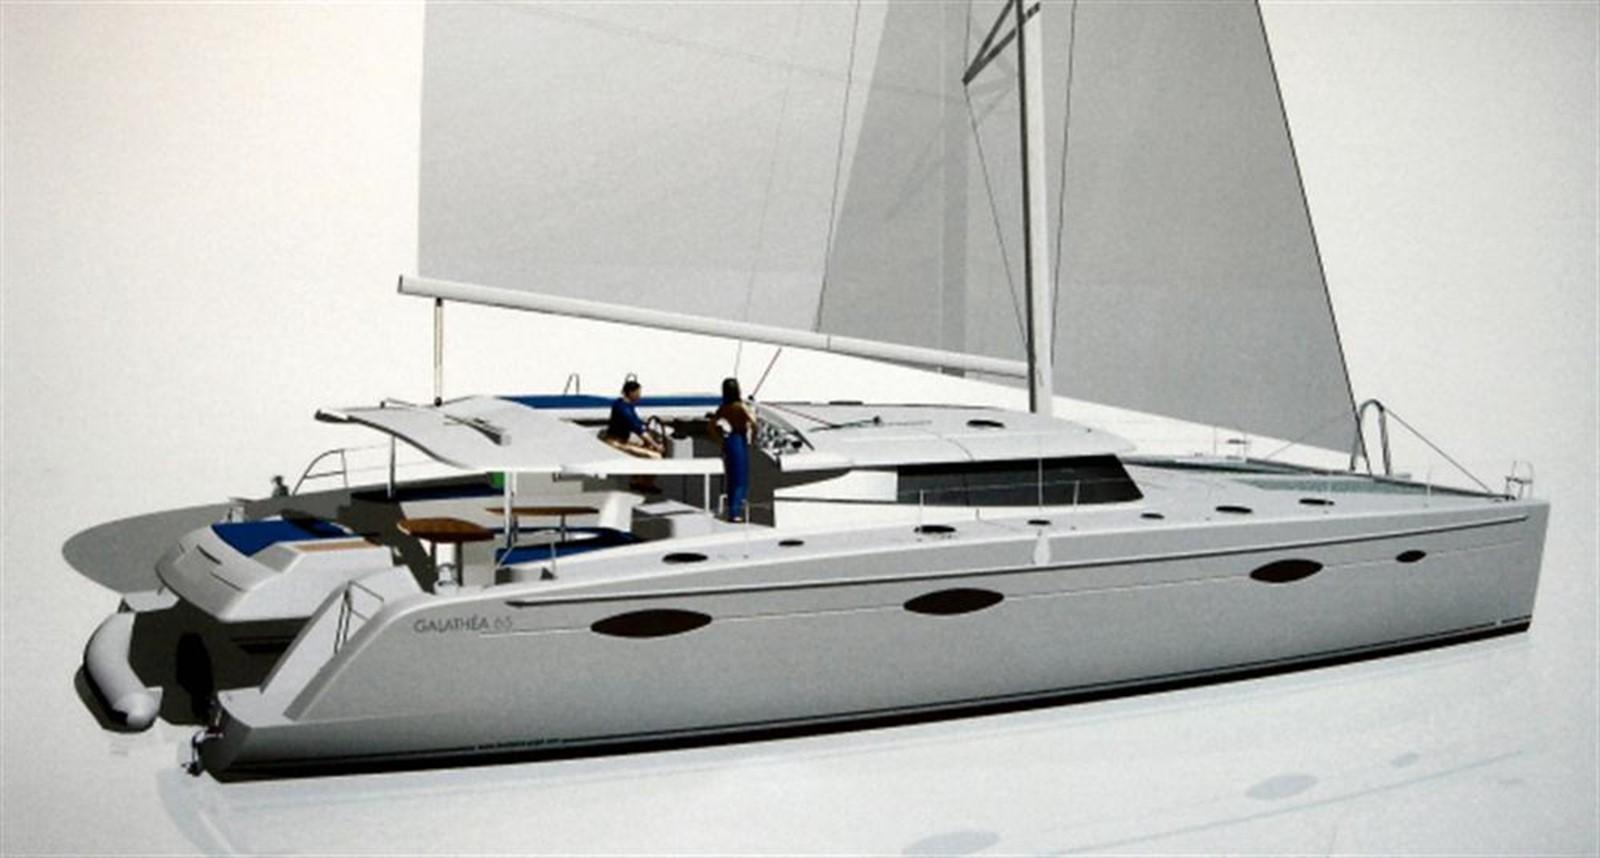 Galathea 65 profile 2008 FOUNTAINE PAJOT  Catamaran 87833